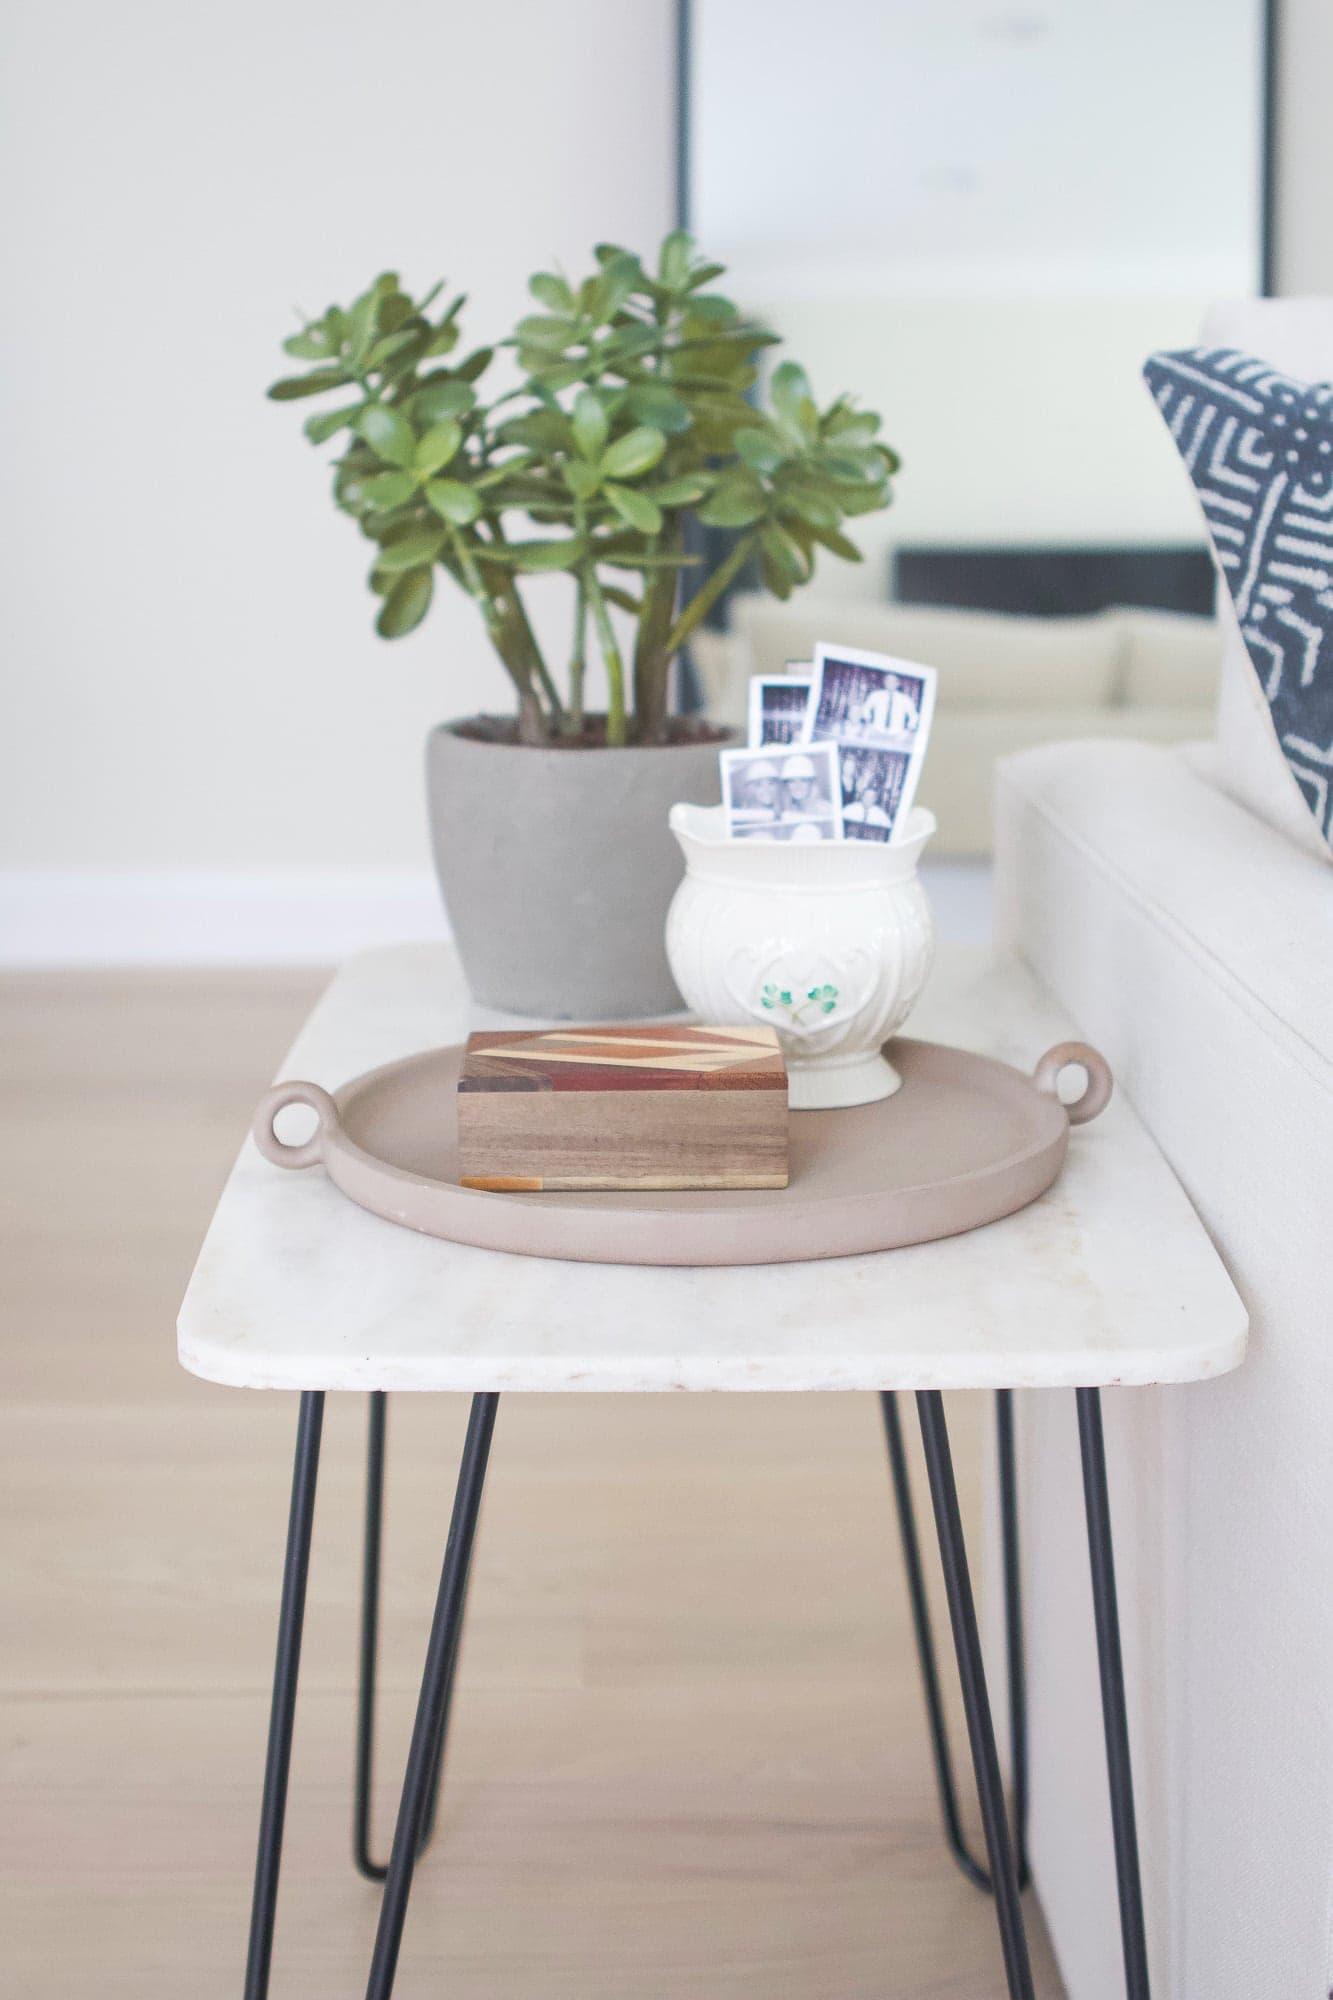 DIY side table